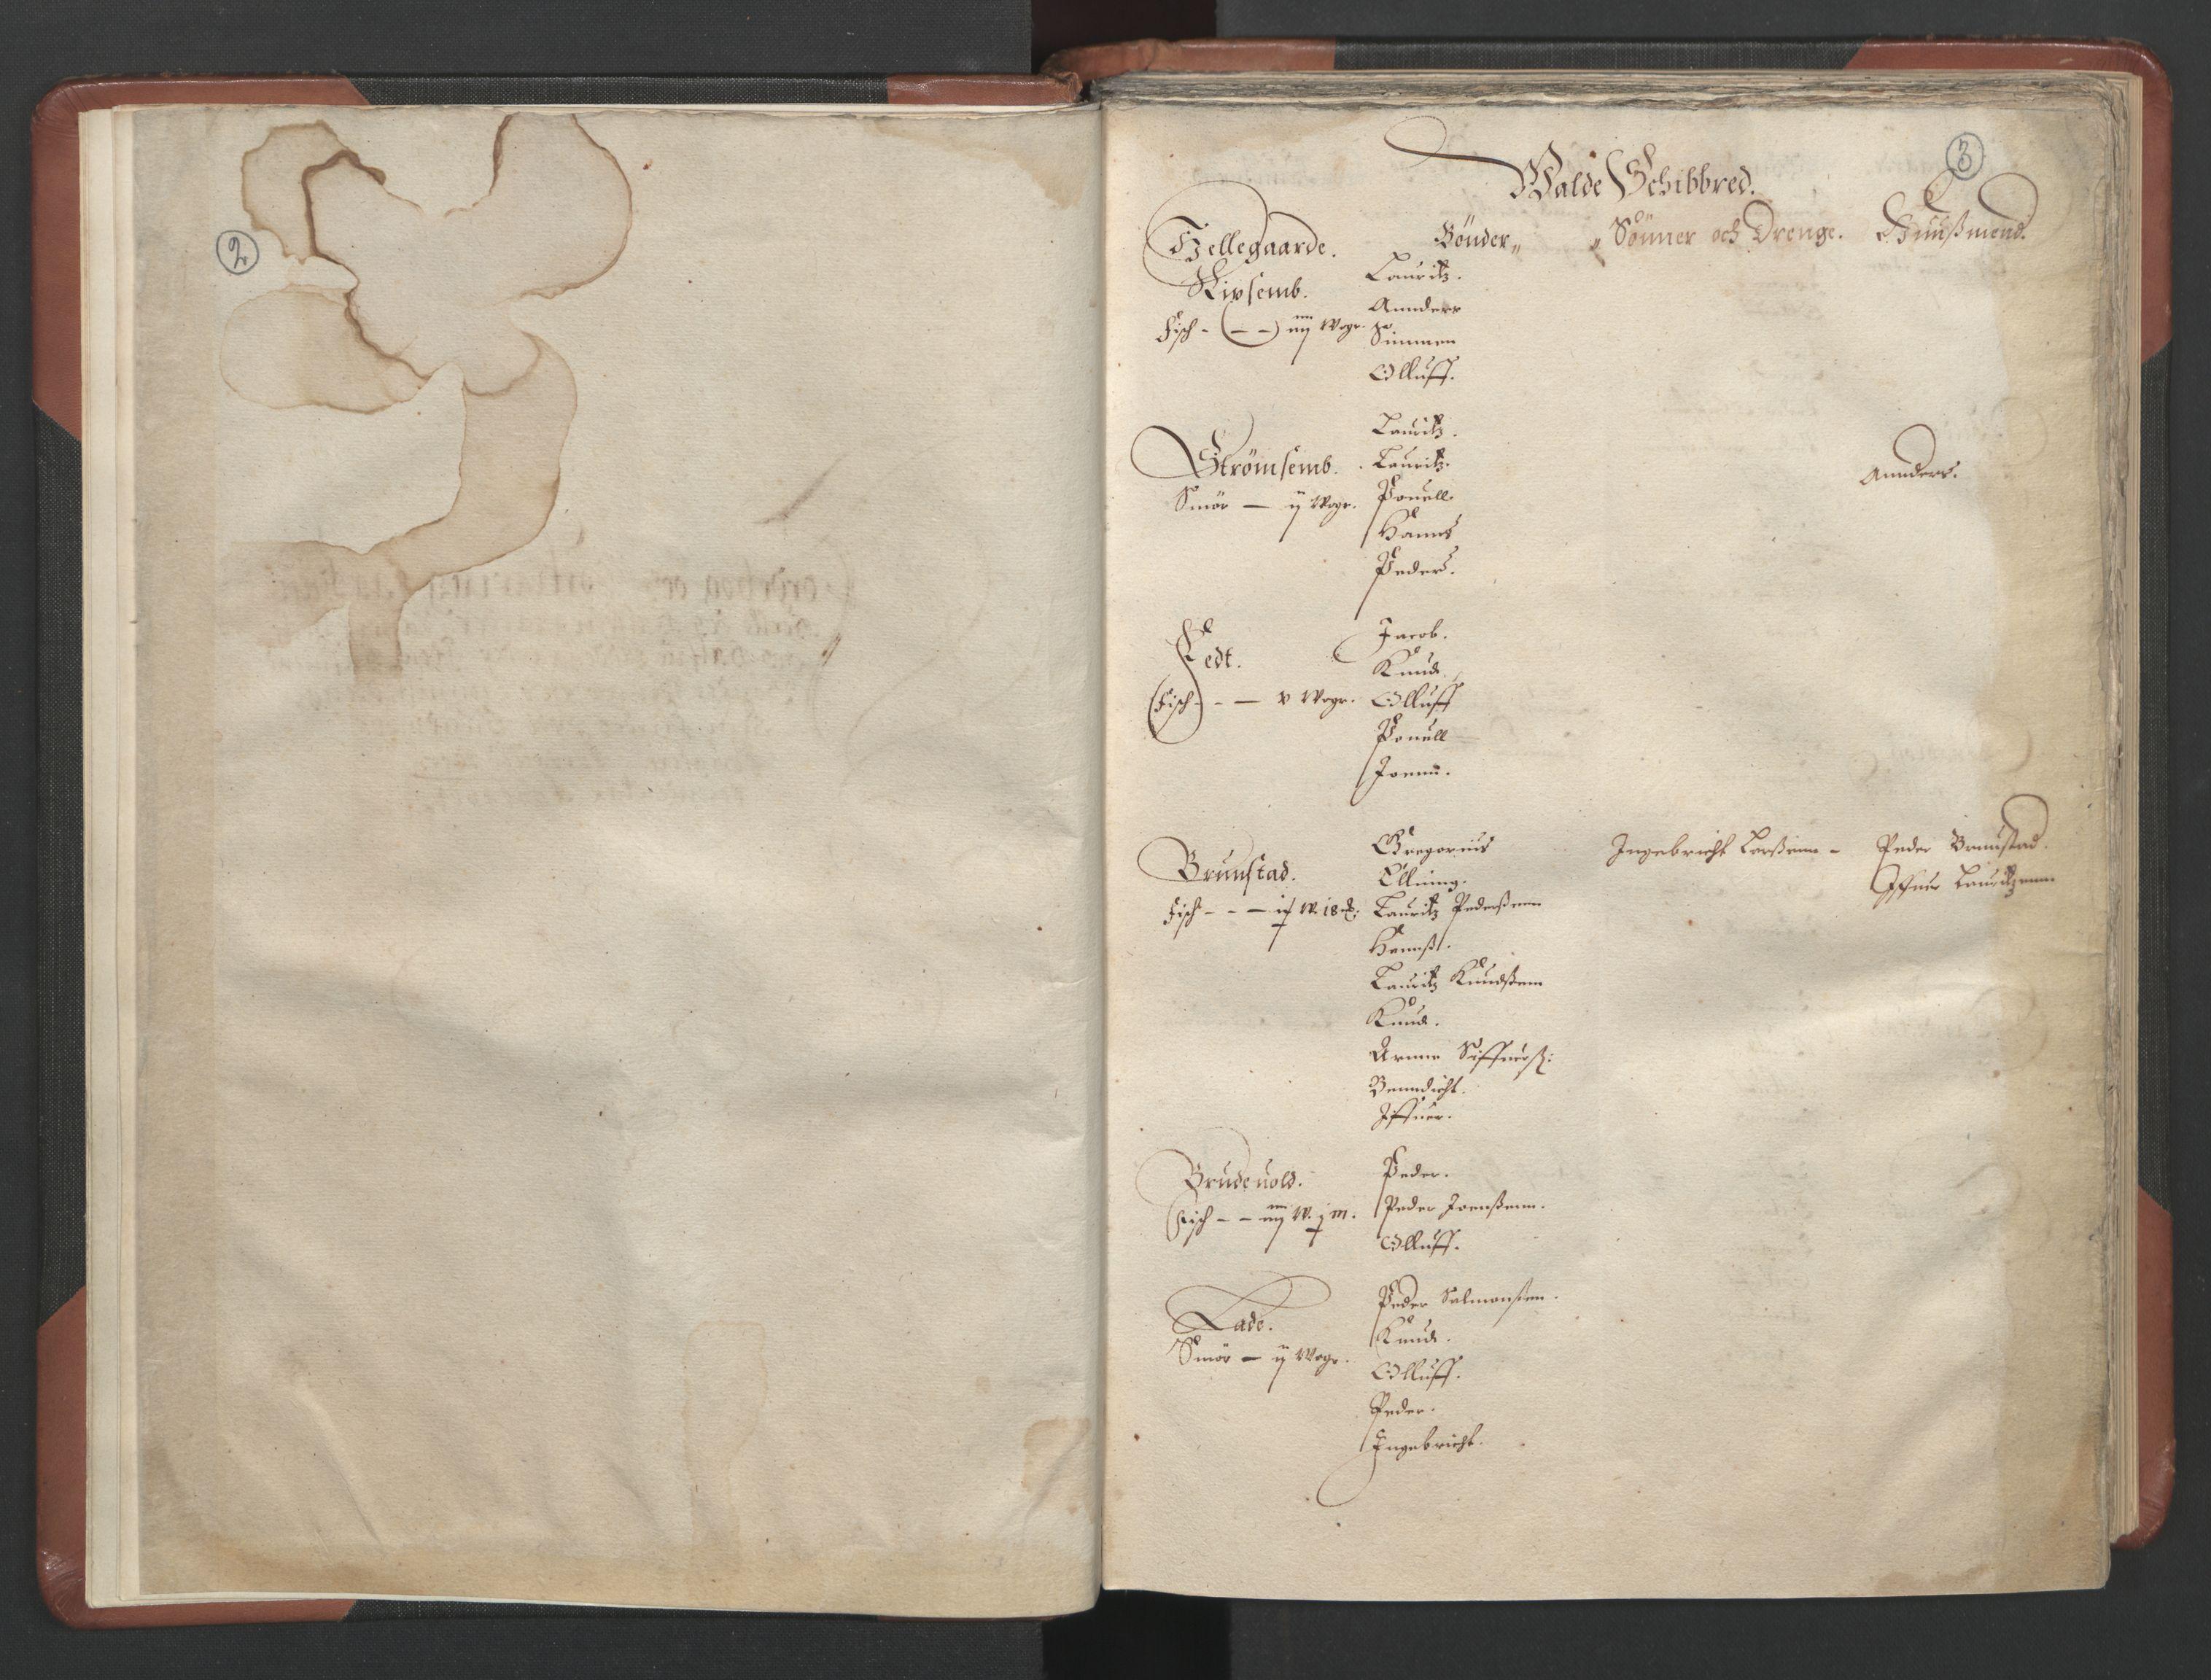 RA, Fogdenes og sorenskrivernes manntall 1664-1666, nr. 16: Romsdal fogderi og Sunnmøre fogderi, 1664-1665, s. 2-3